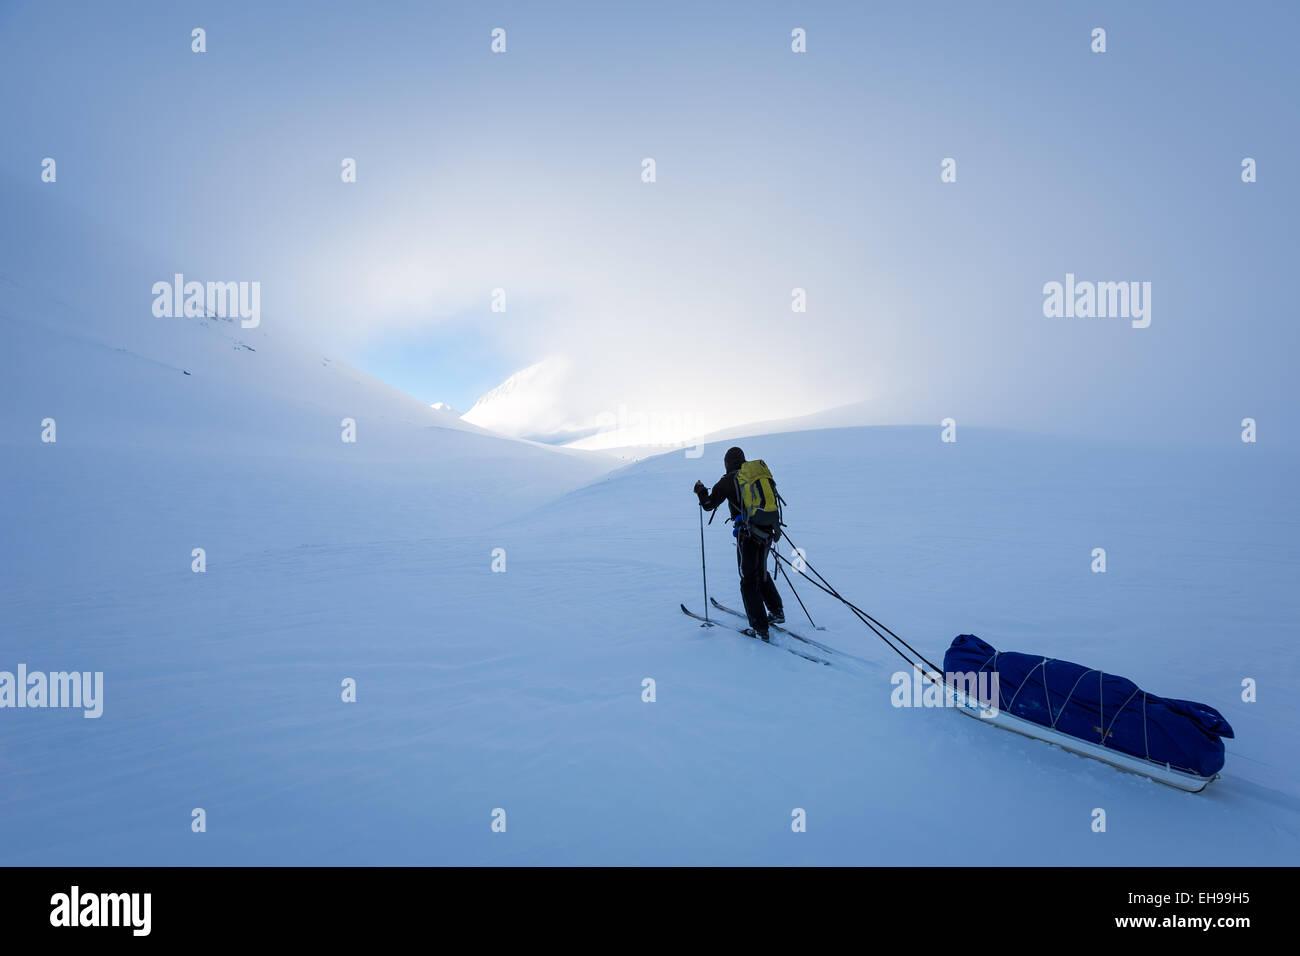 Ski randonnée près de Nallostugan, Kiruna, Suède, Europe, UNION EUROPÉENNE Photo Stock